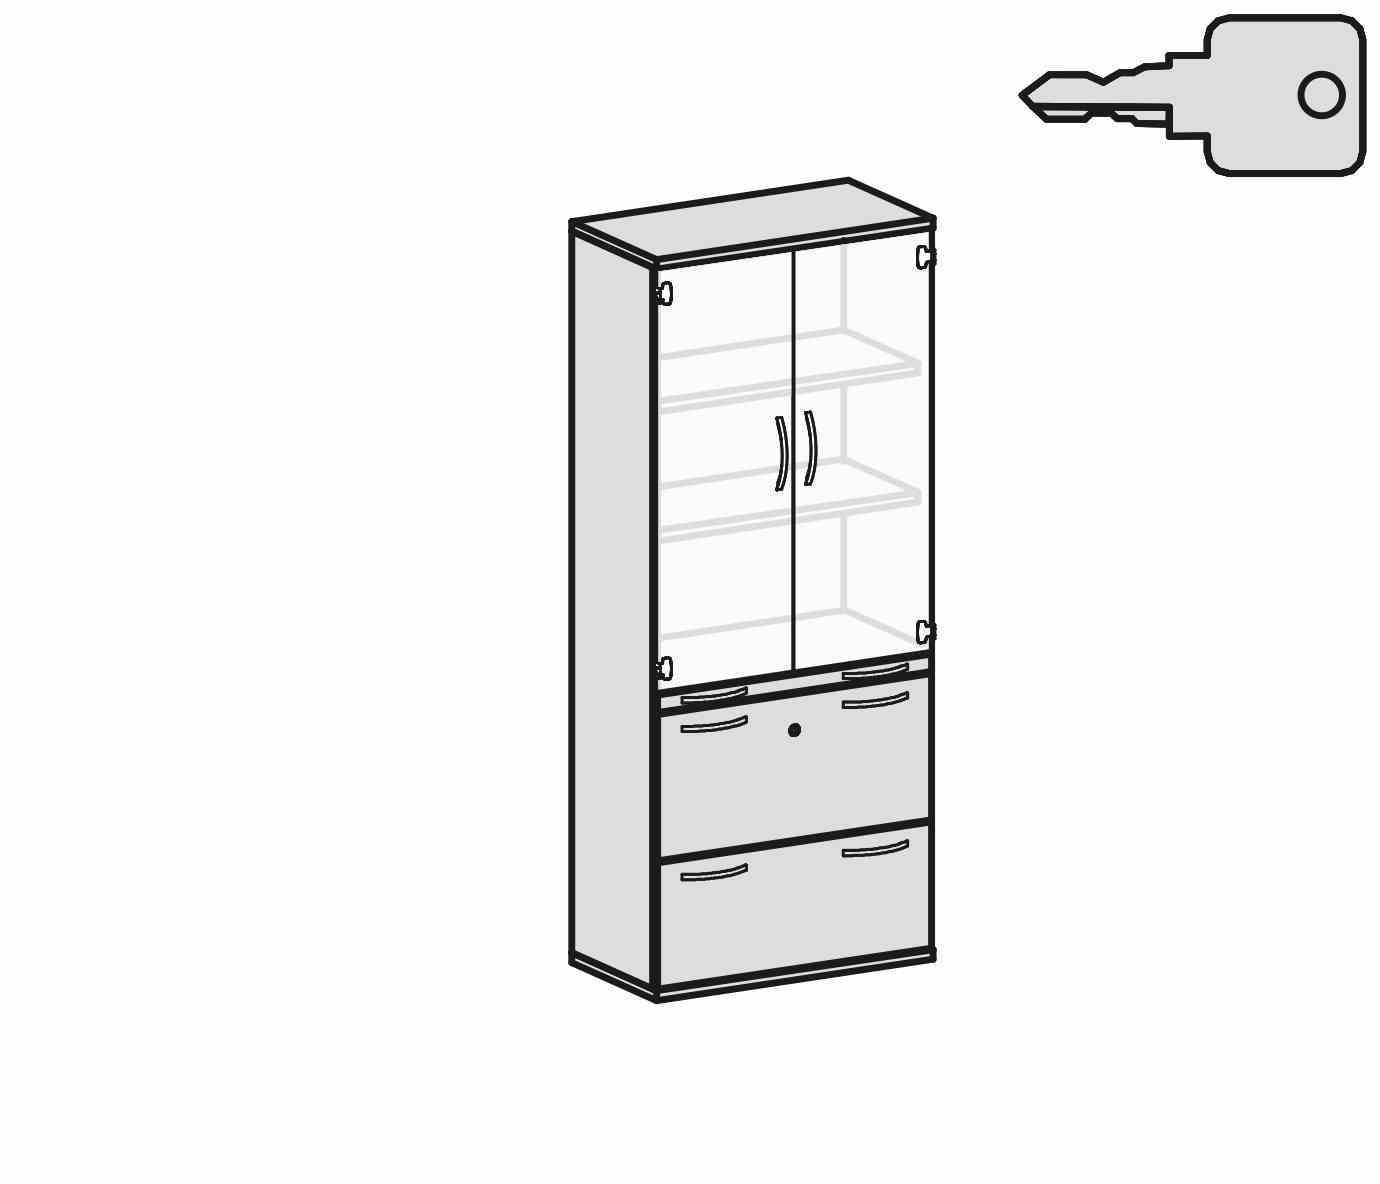 garderobenschrank 80 cm breit select garderobenschrank 4. Black Bedroom Furniture Sets. Home Design Ideas